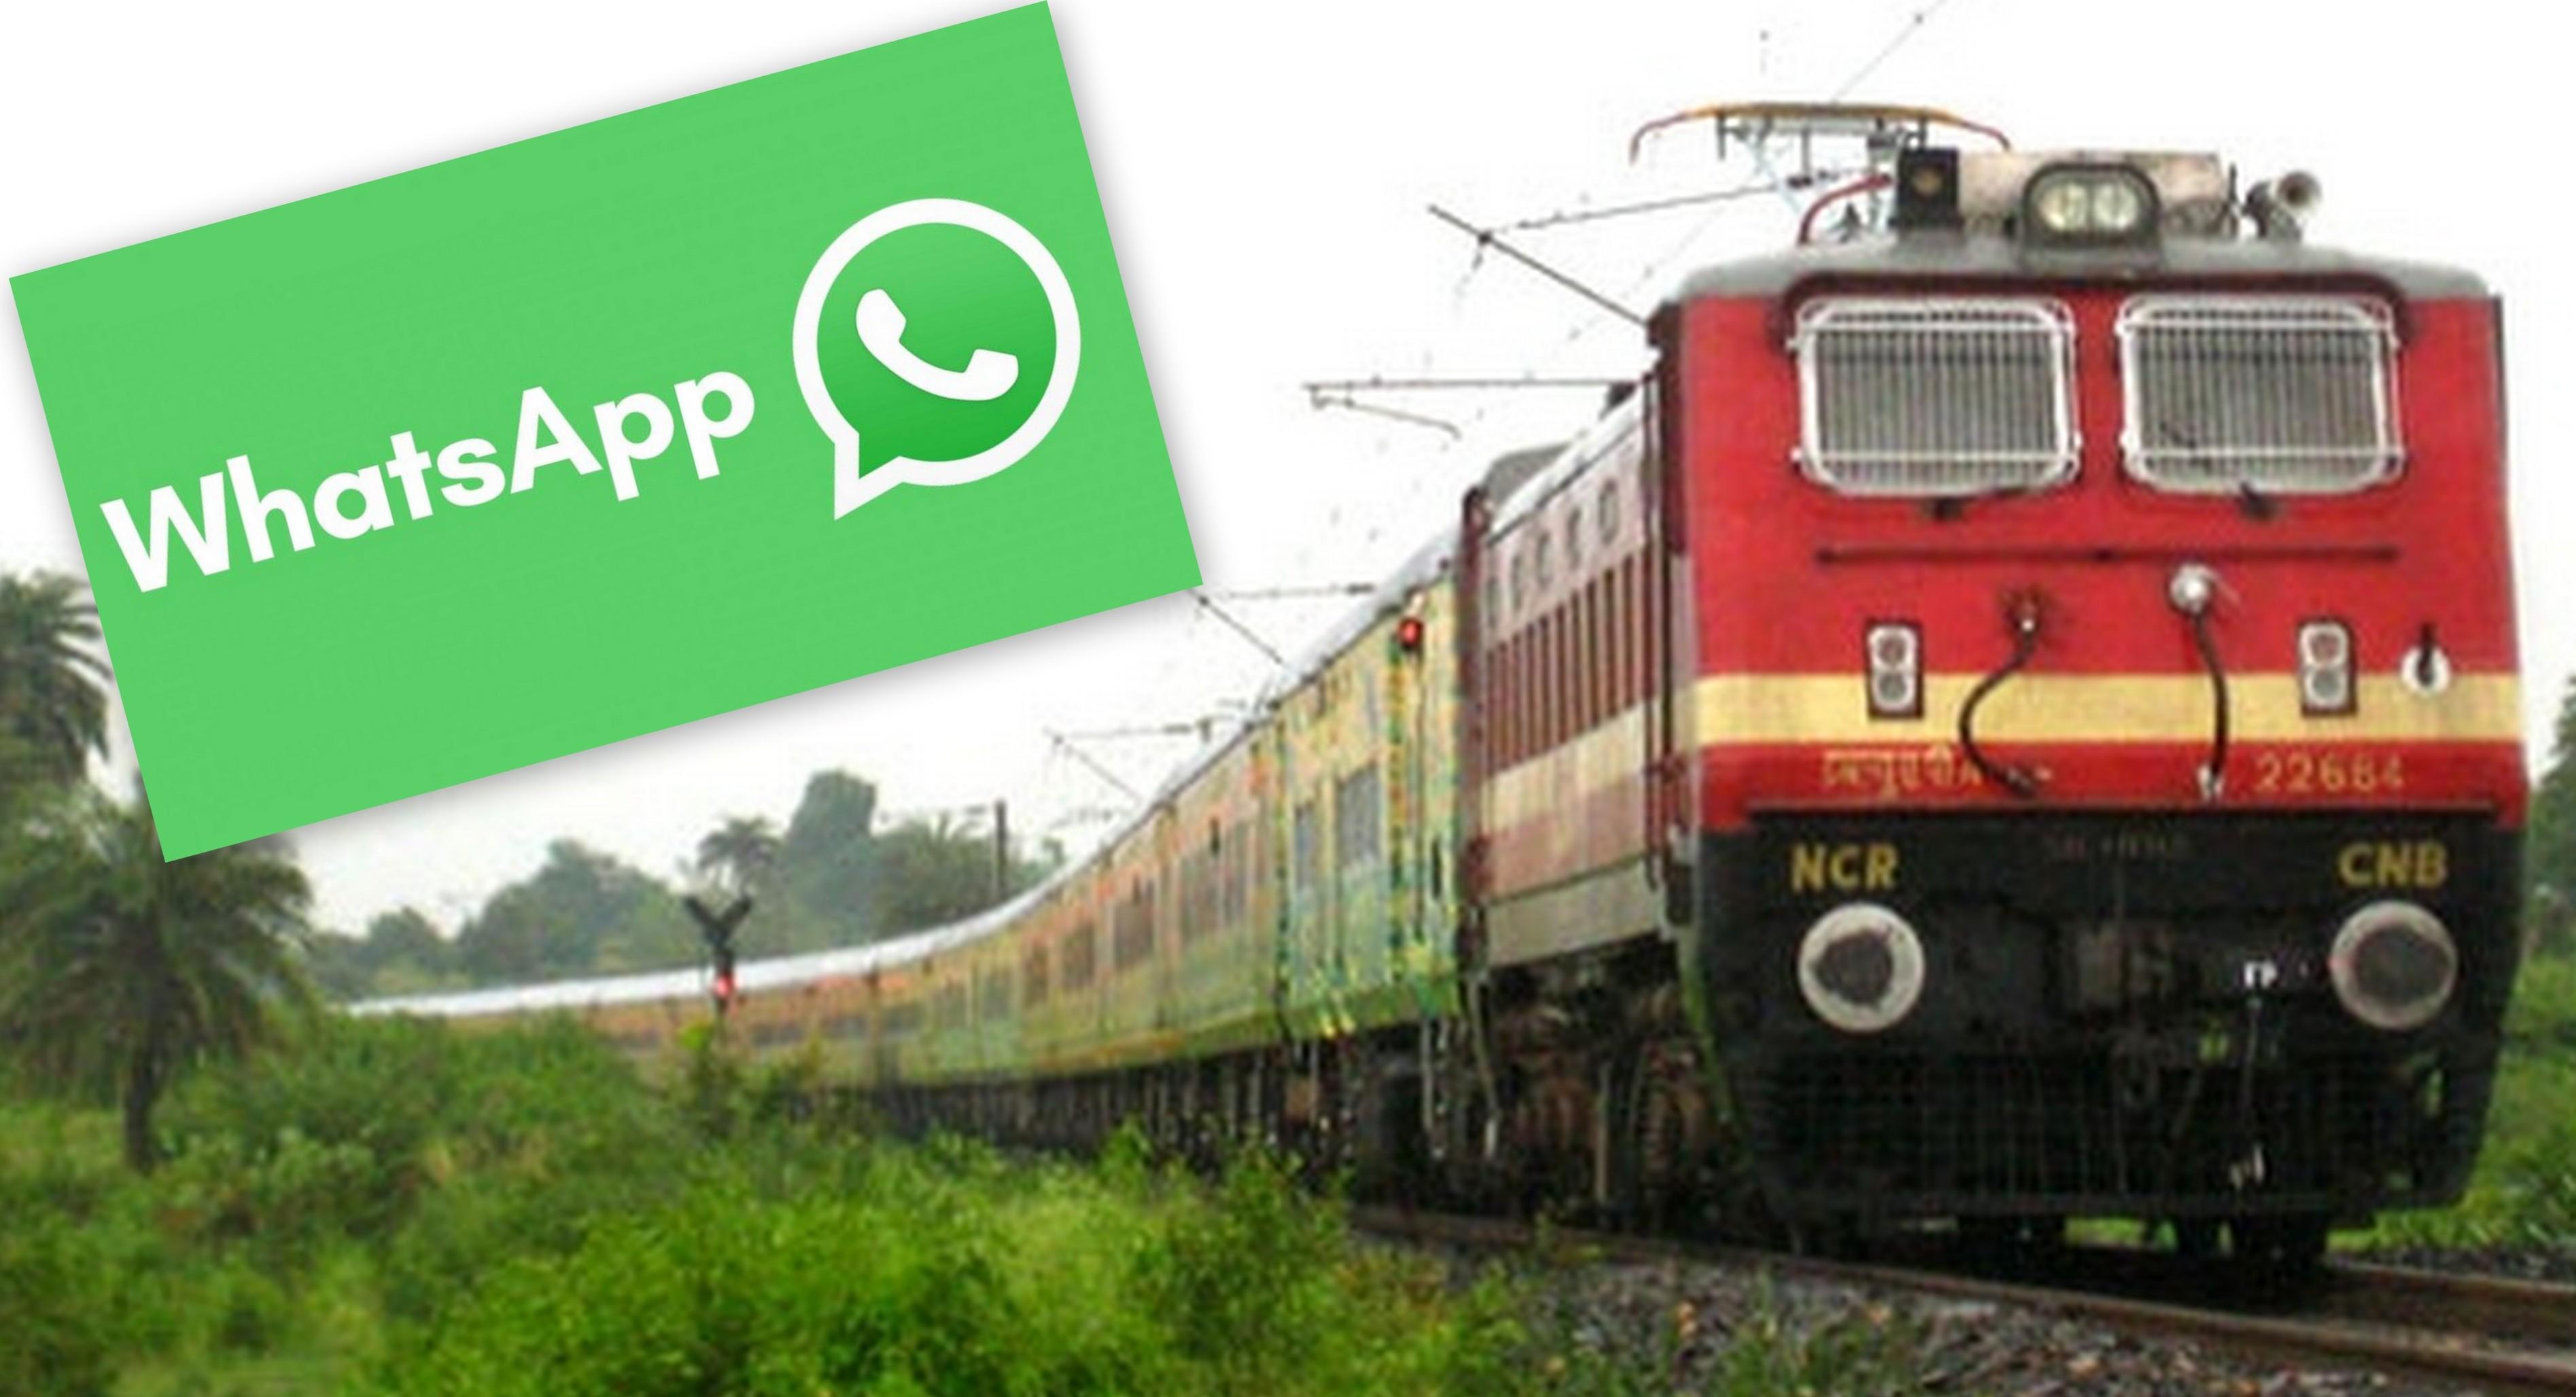 Northern Railways to monitor trains using WhatsApp